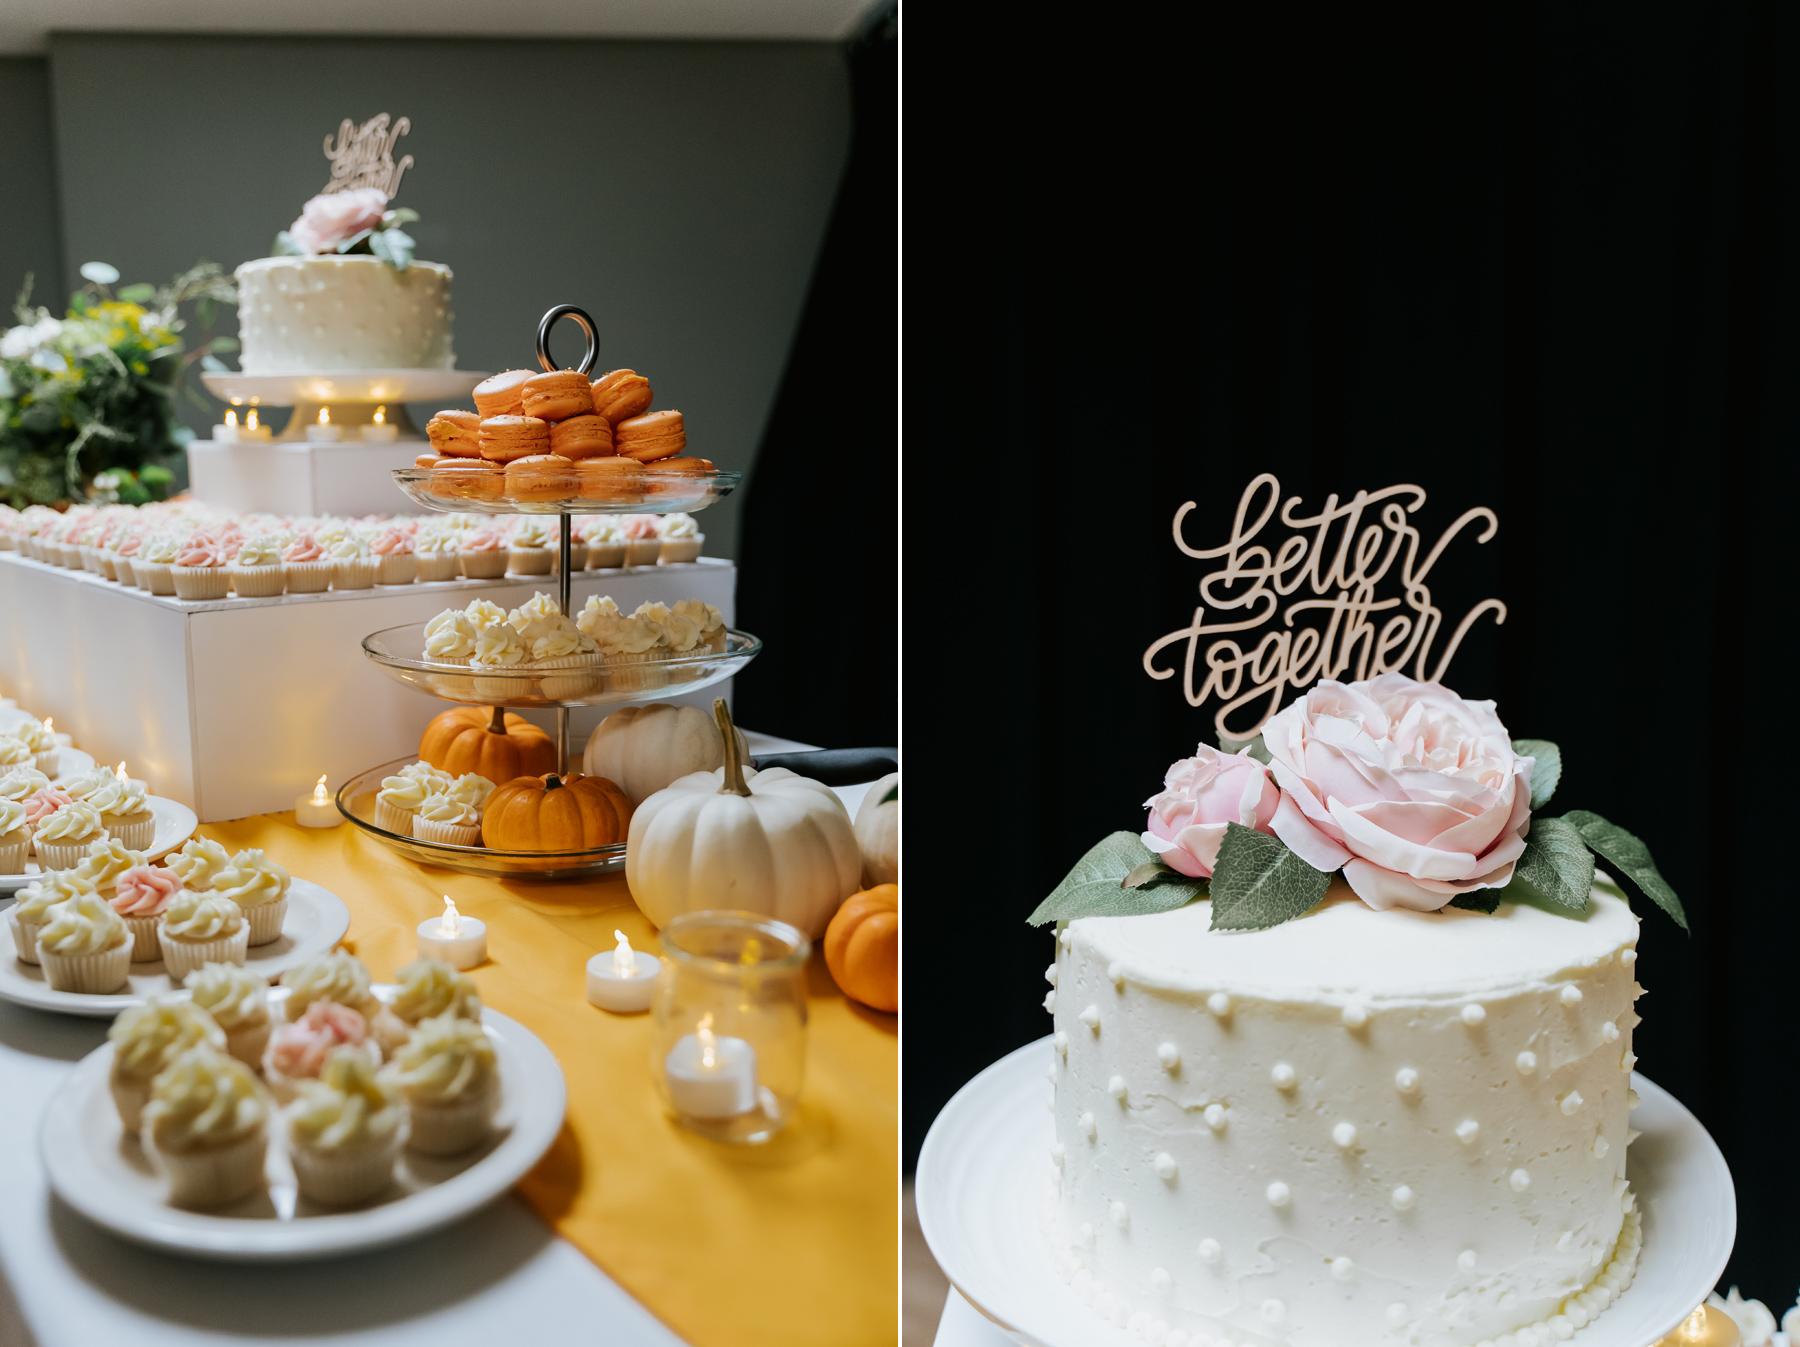 lethbridge-wedding-photography-pd2019-66